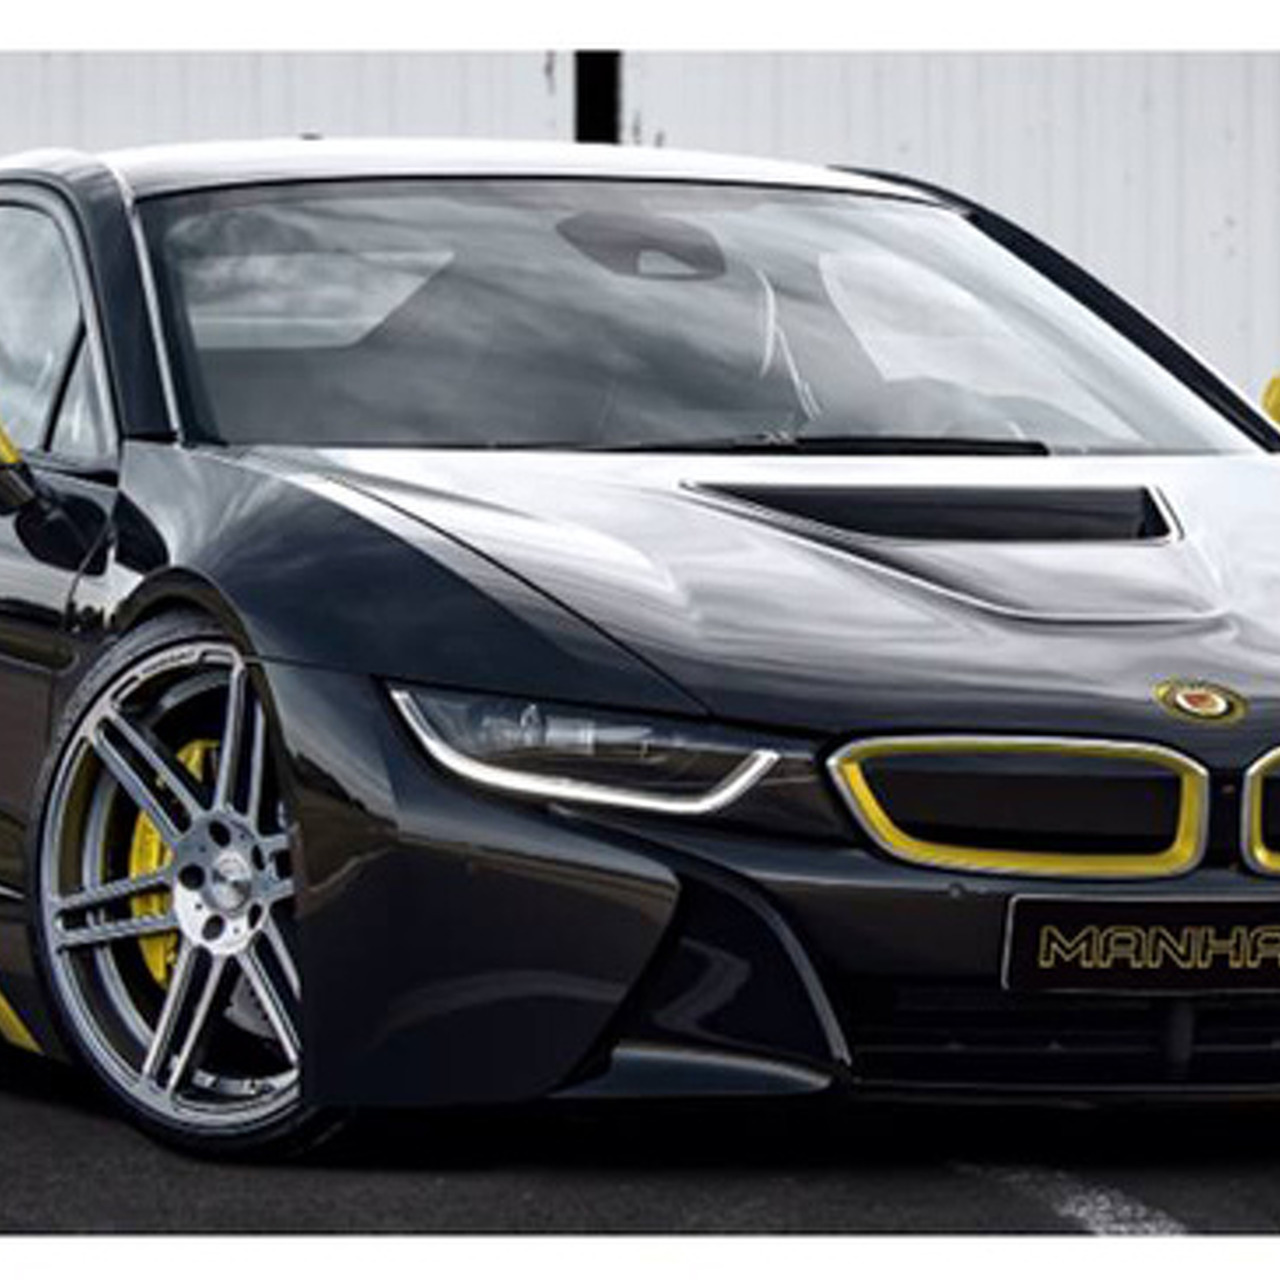 BMW i8 Gets the Custom Treatment